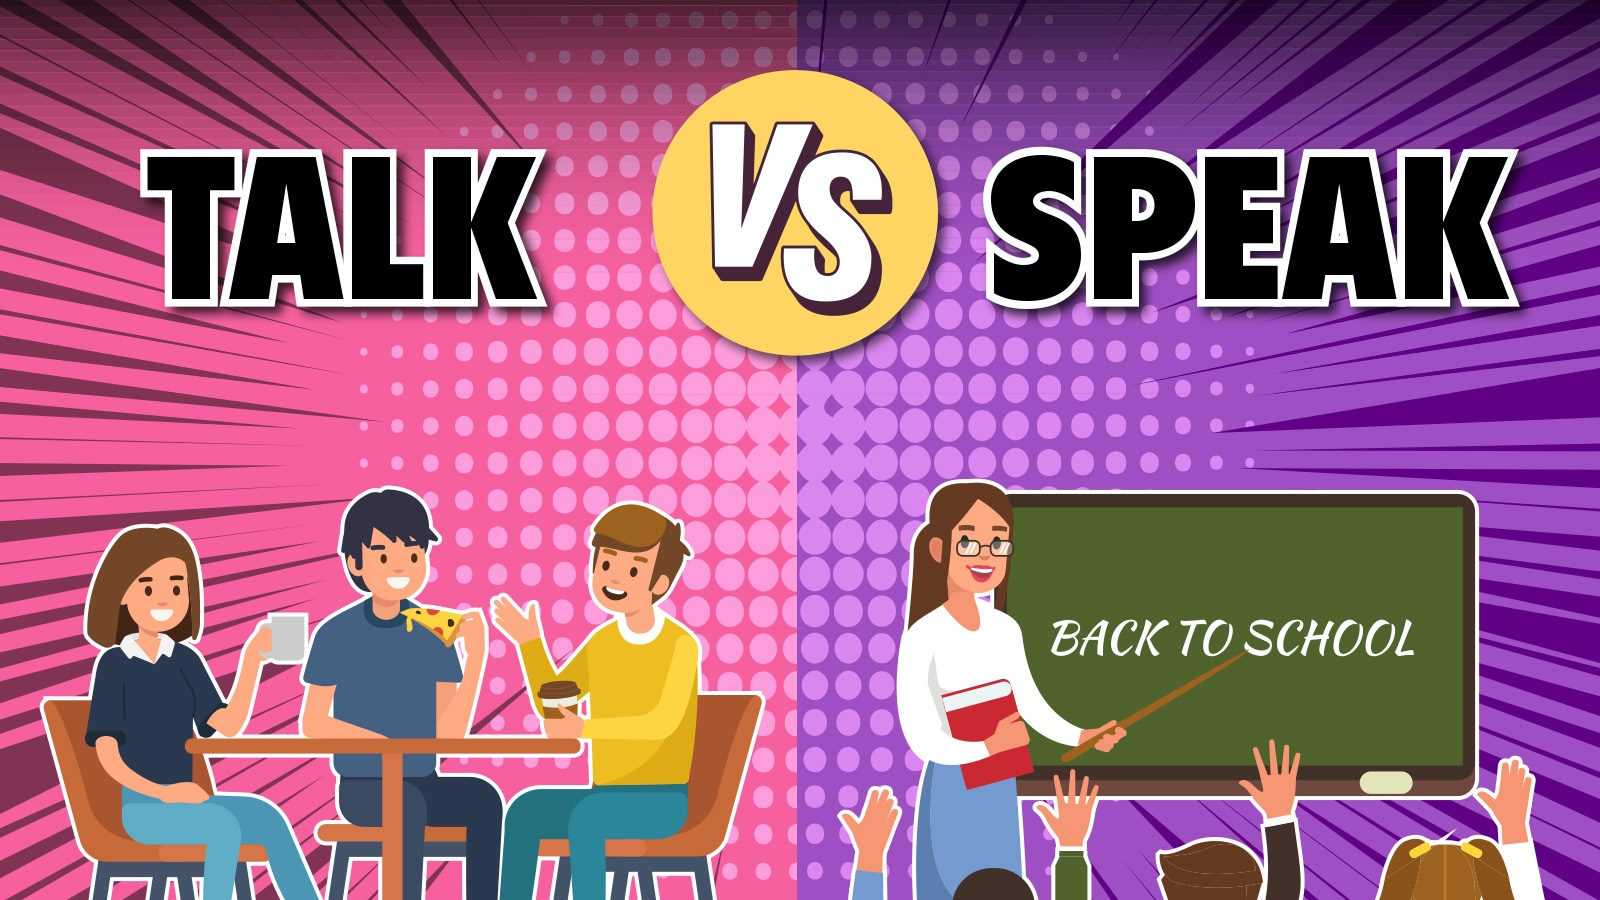 Talk vs Speak Example